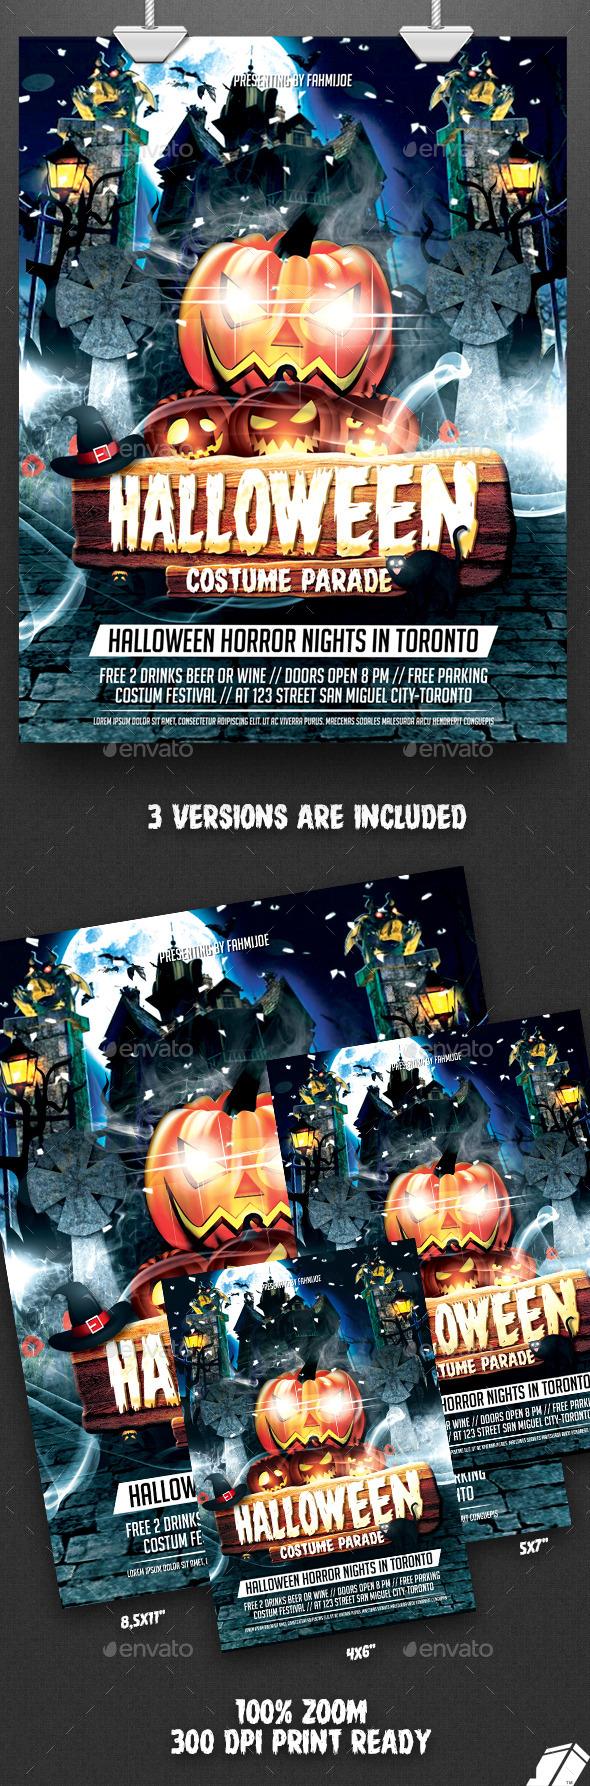 Halloween Flyer Costume Parade Halloween4